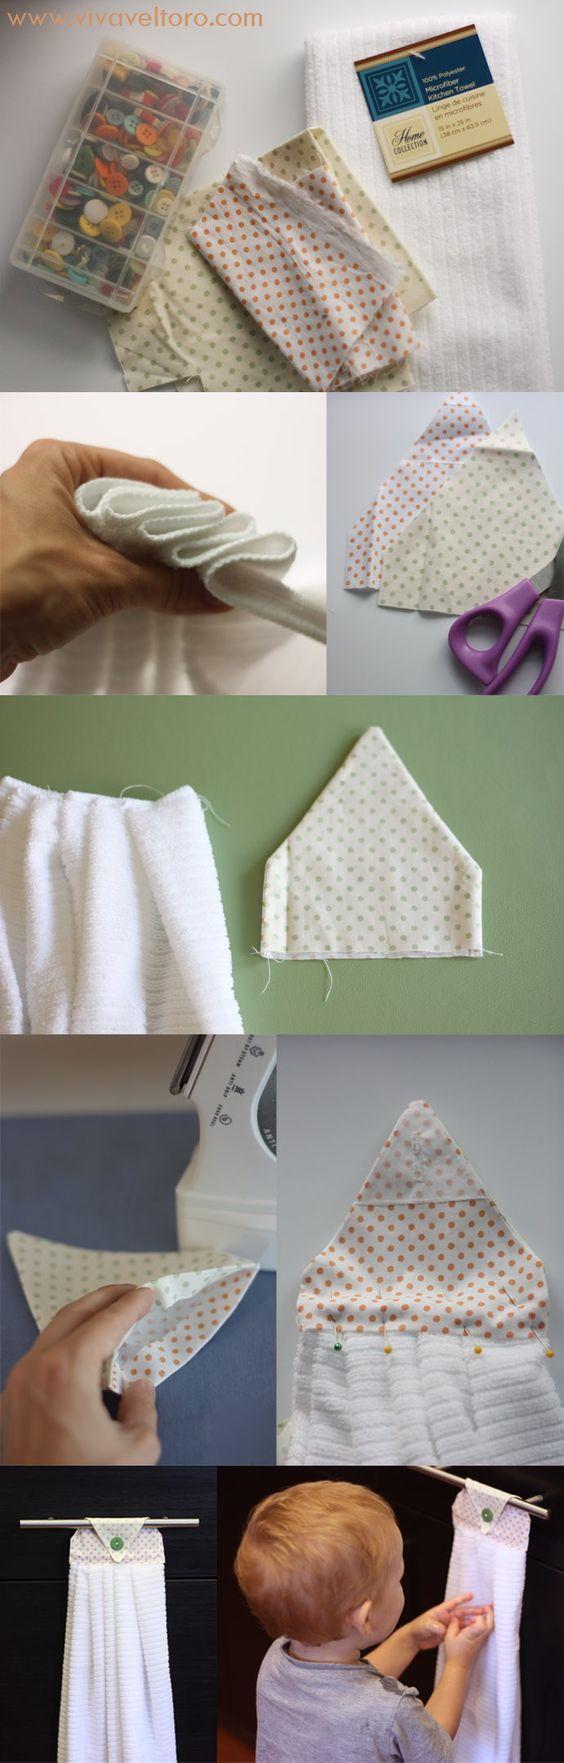 Hanging hand towel tutorial towels diy and crafts and chang 39 e 3 - Hanging kitchen towel tutorial ...